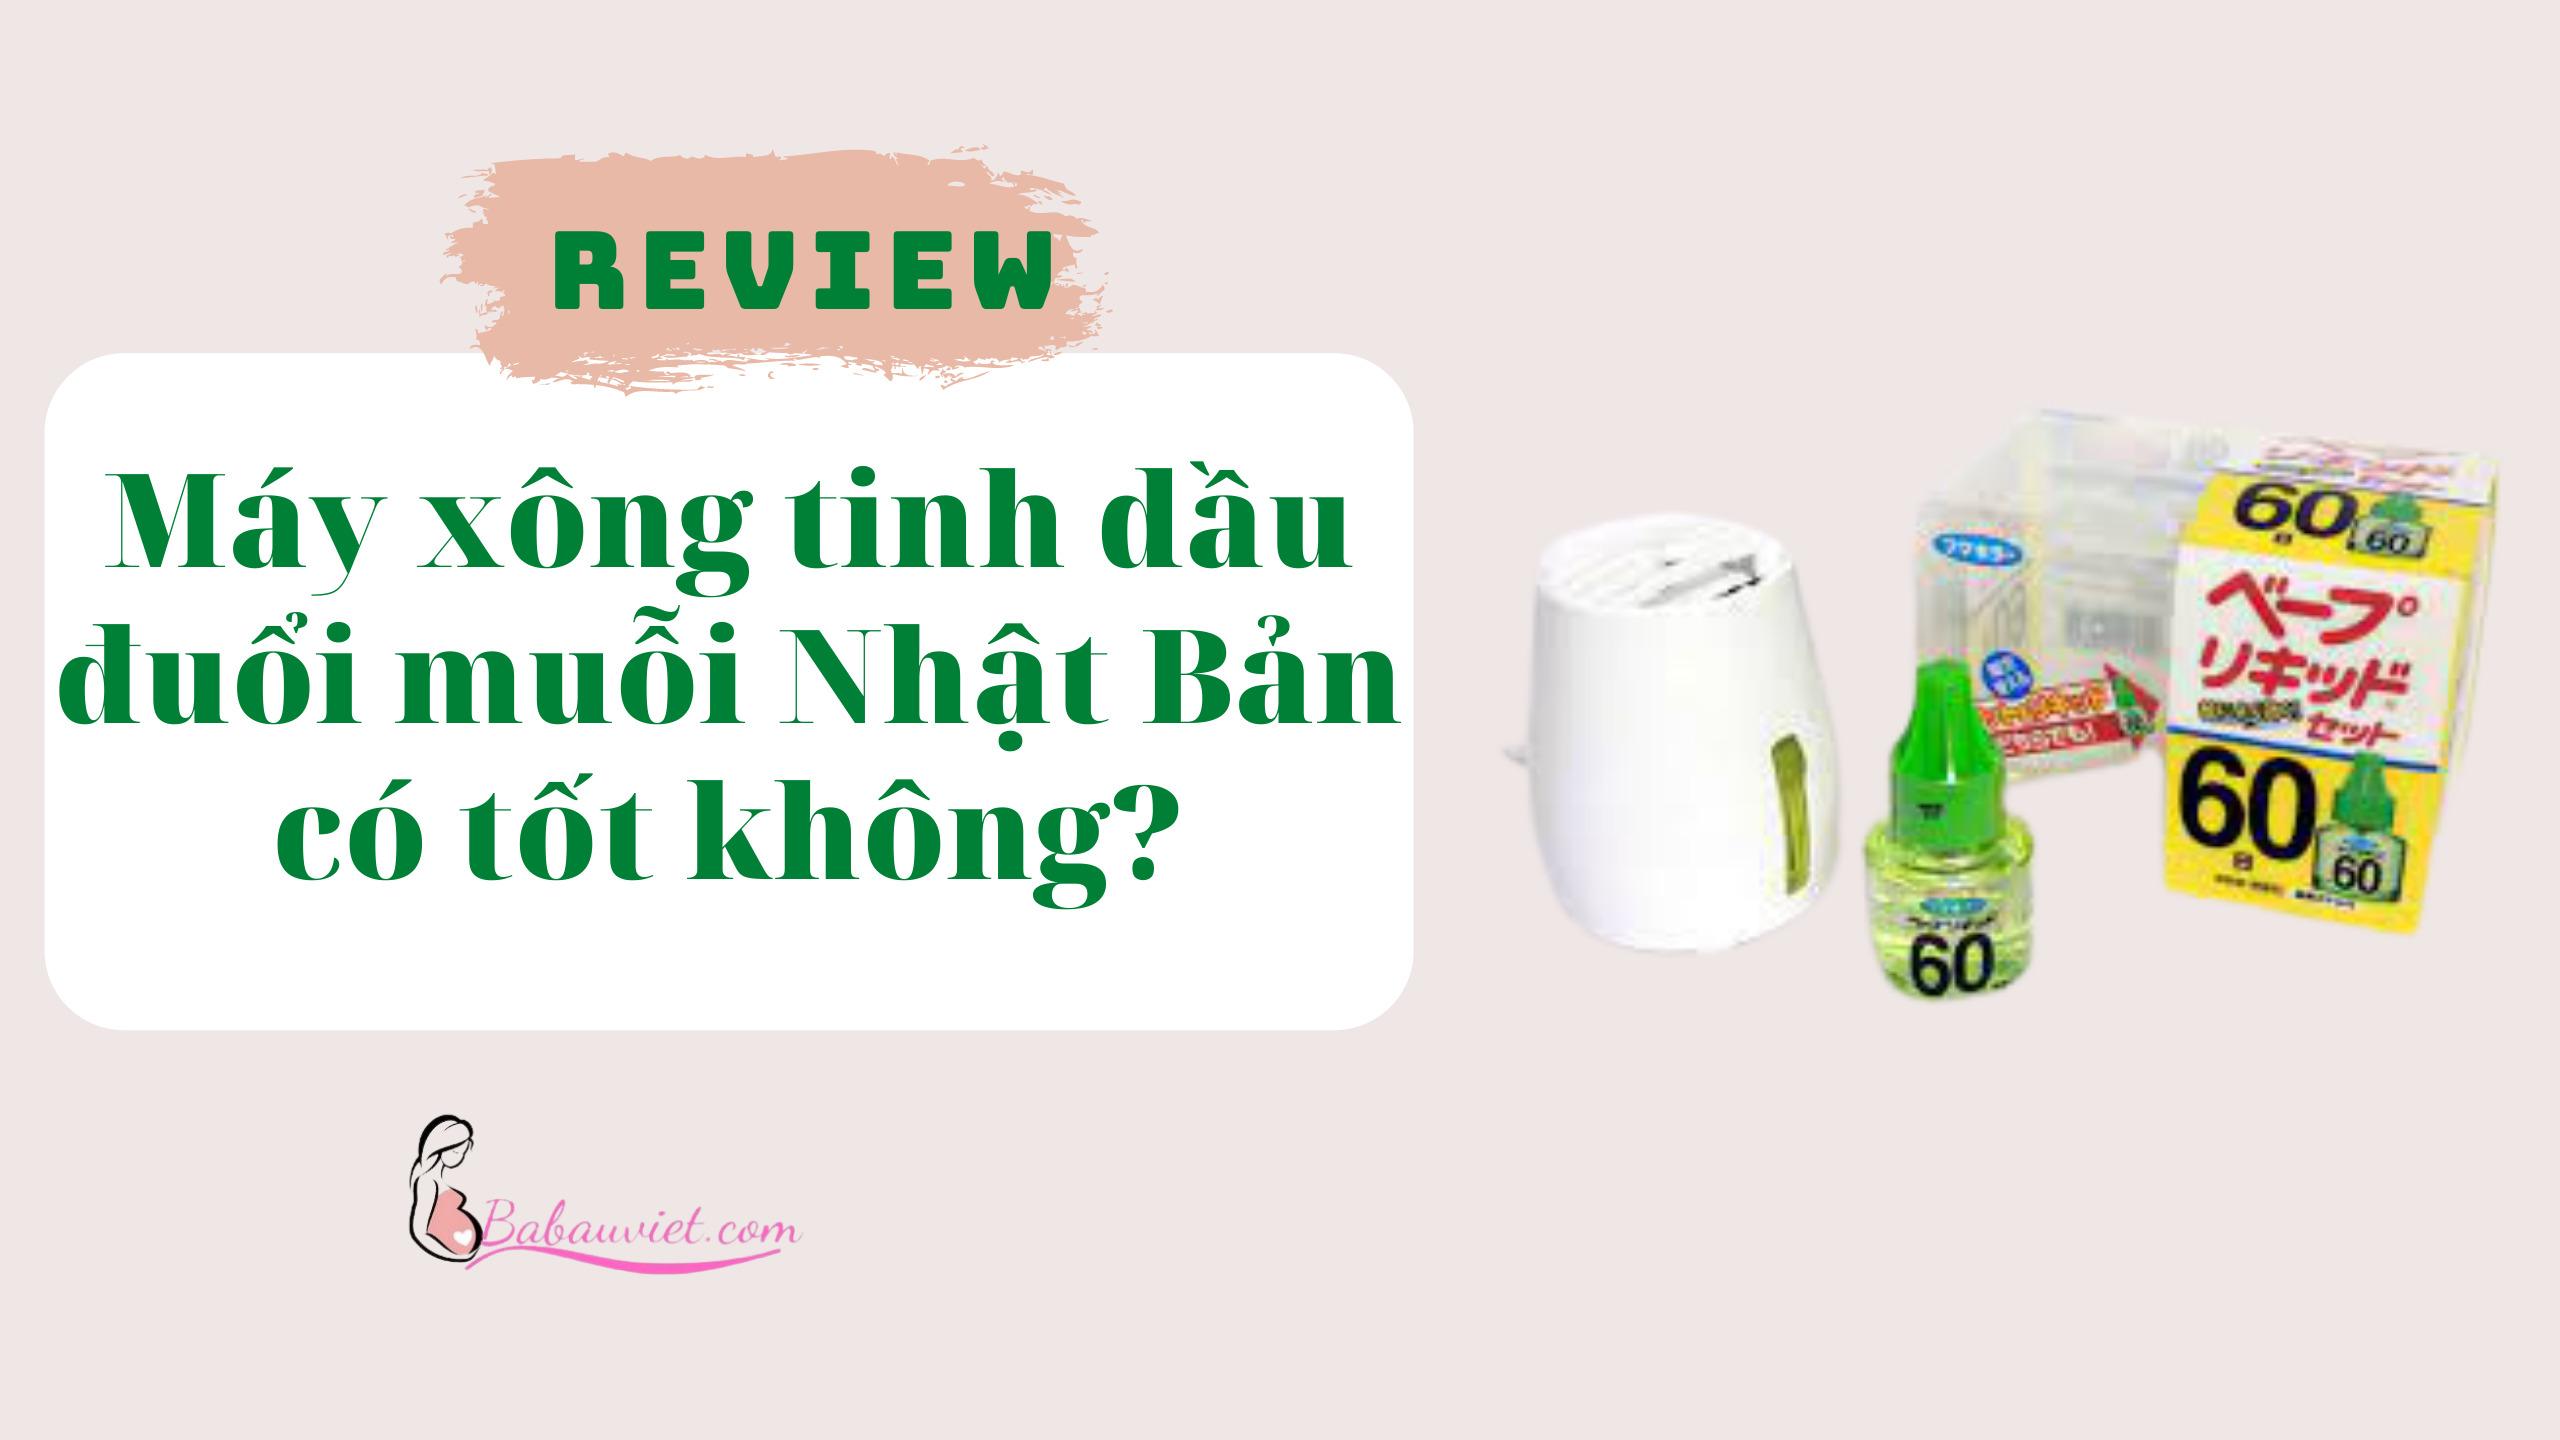 Review may xong tinh dau duoi muoi cua Nhat Ban